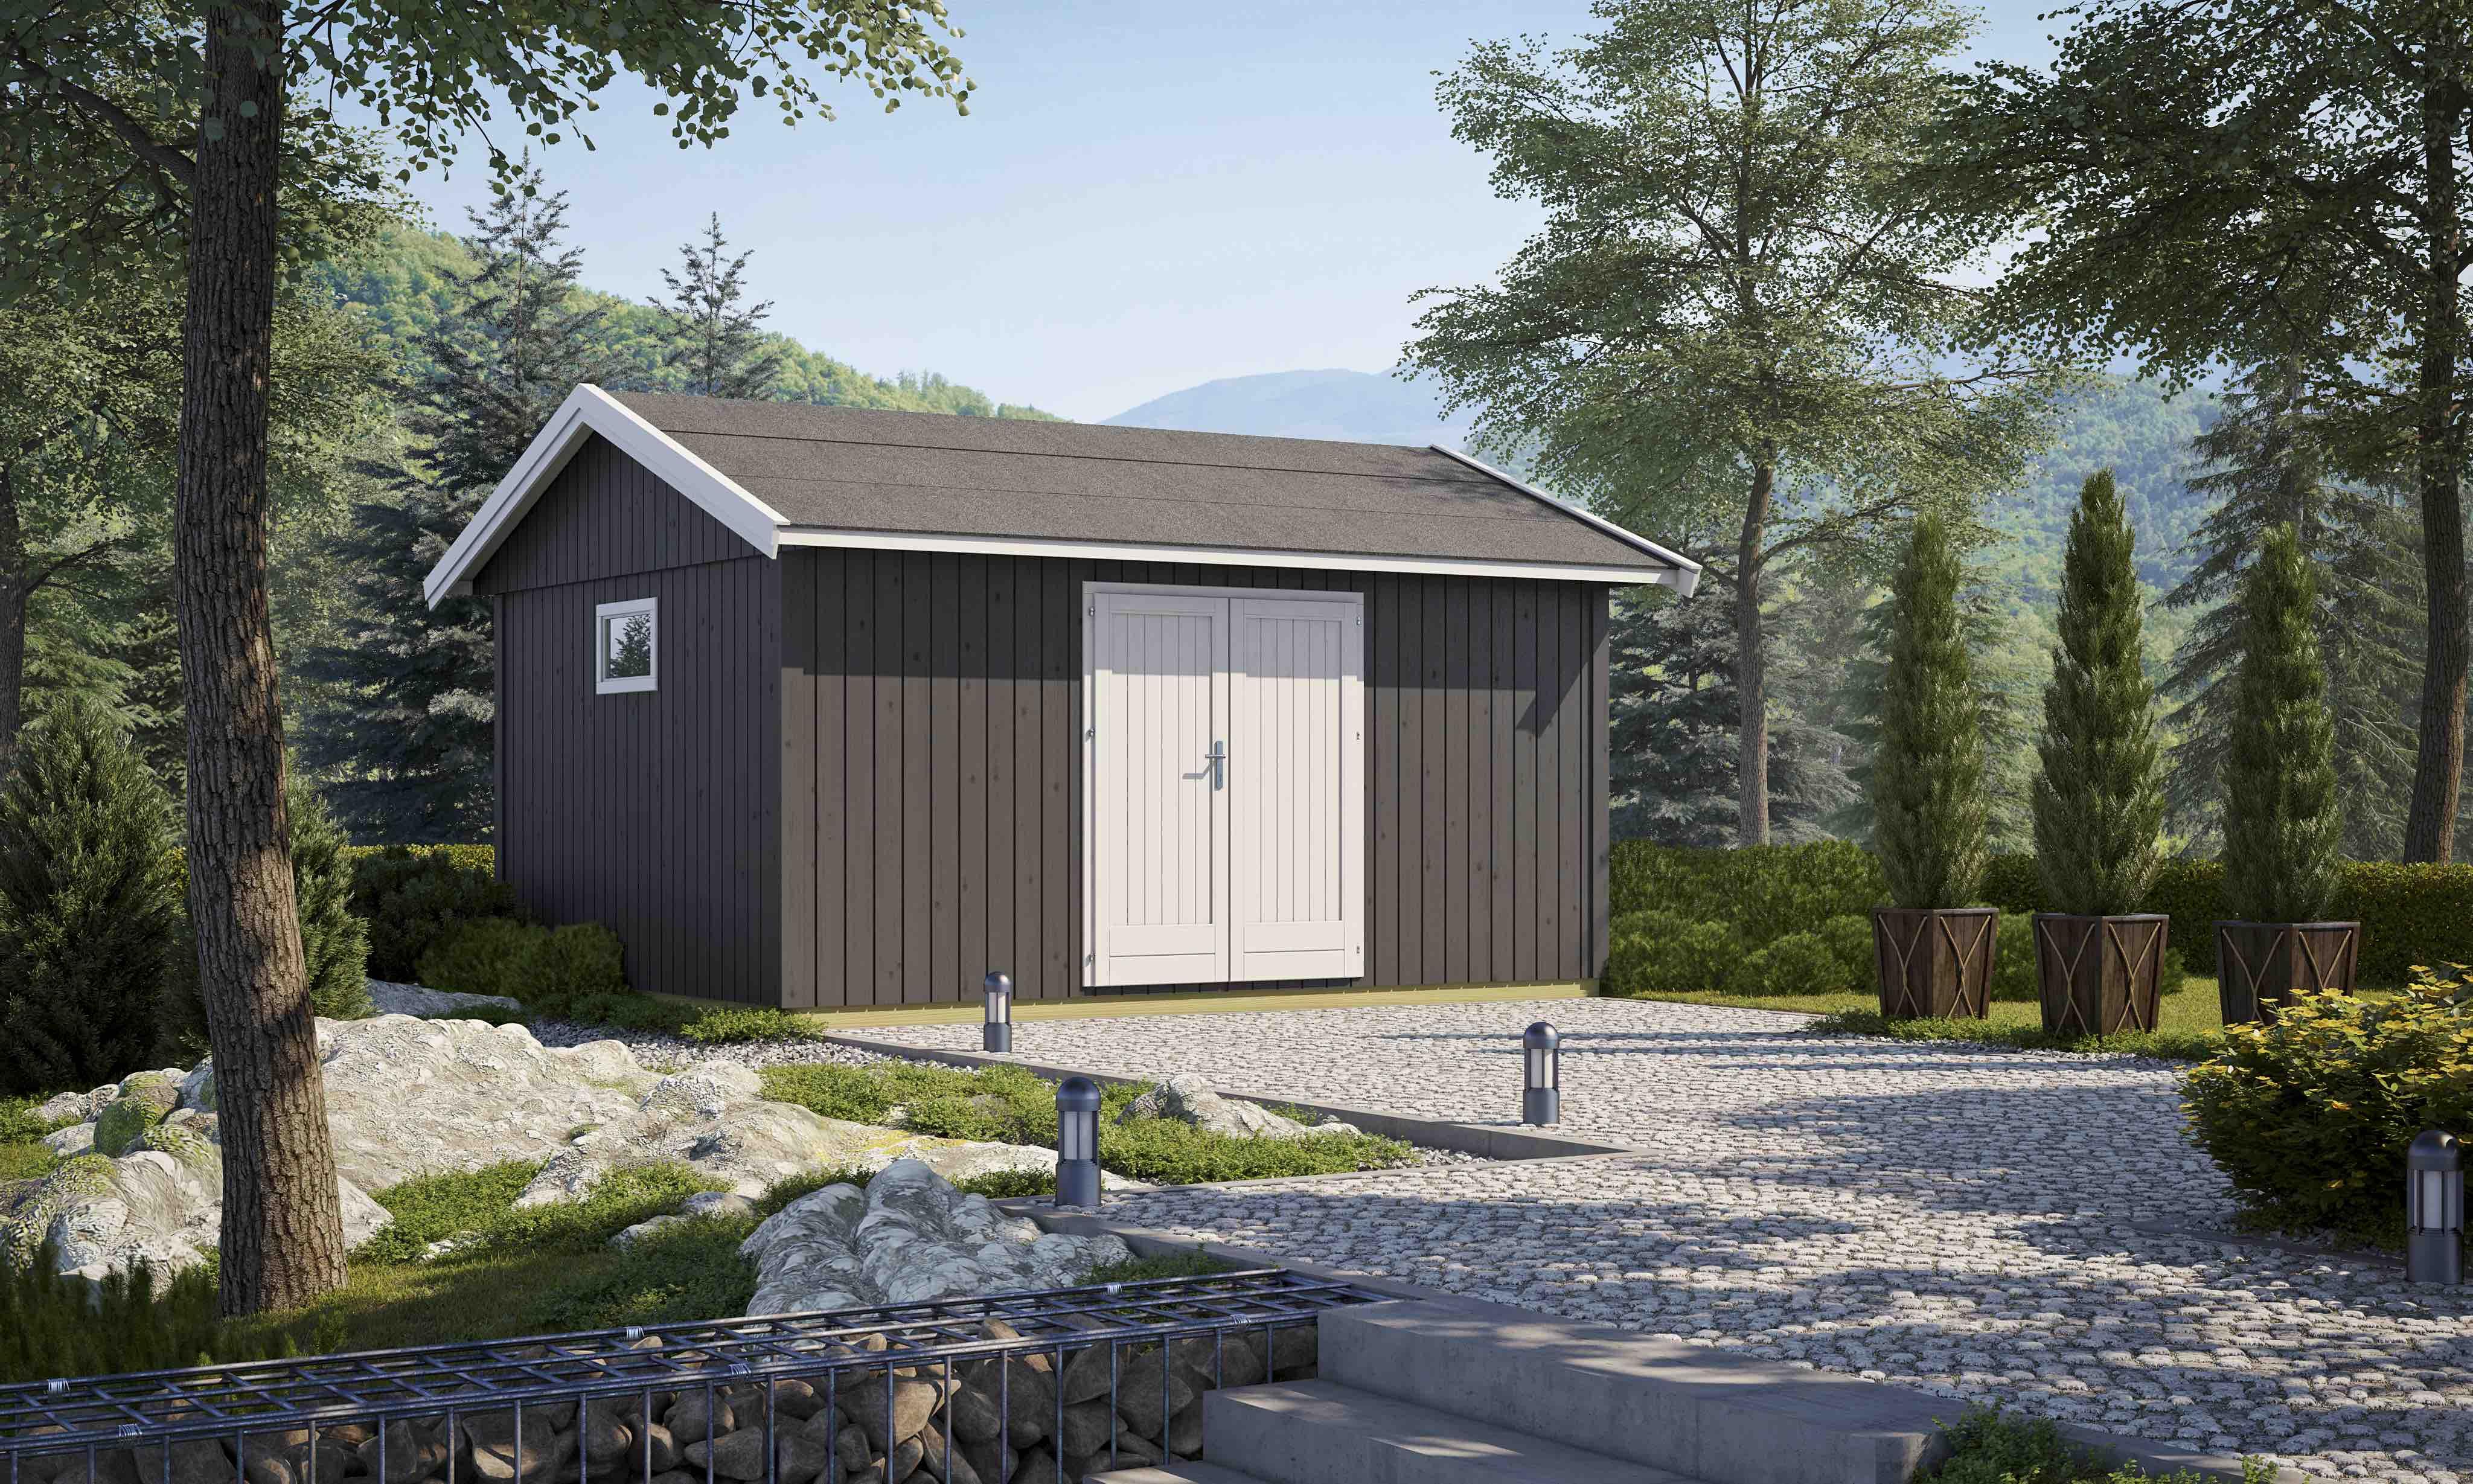 gartenhaus nordic 15 122 mm ca 444x344 cm holzwurm obersayn. Black Bedroom Furniture Sets. Home Design Ideas